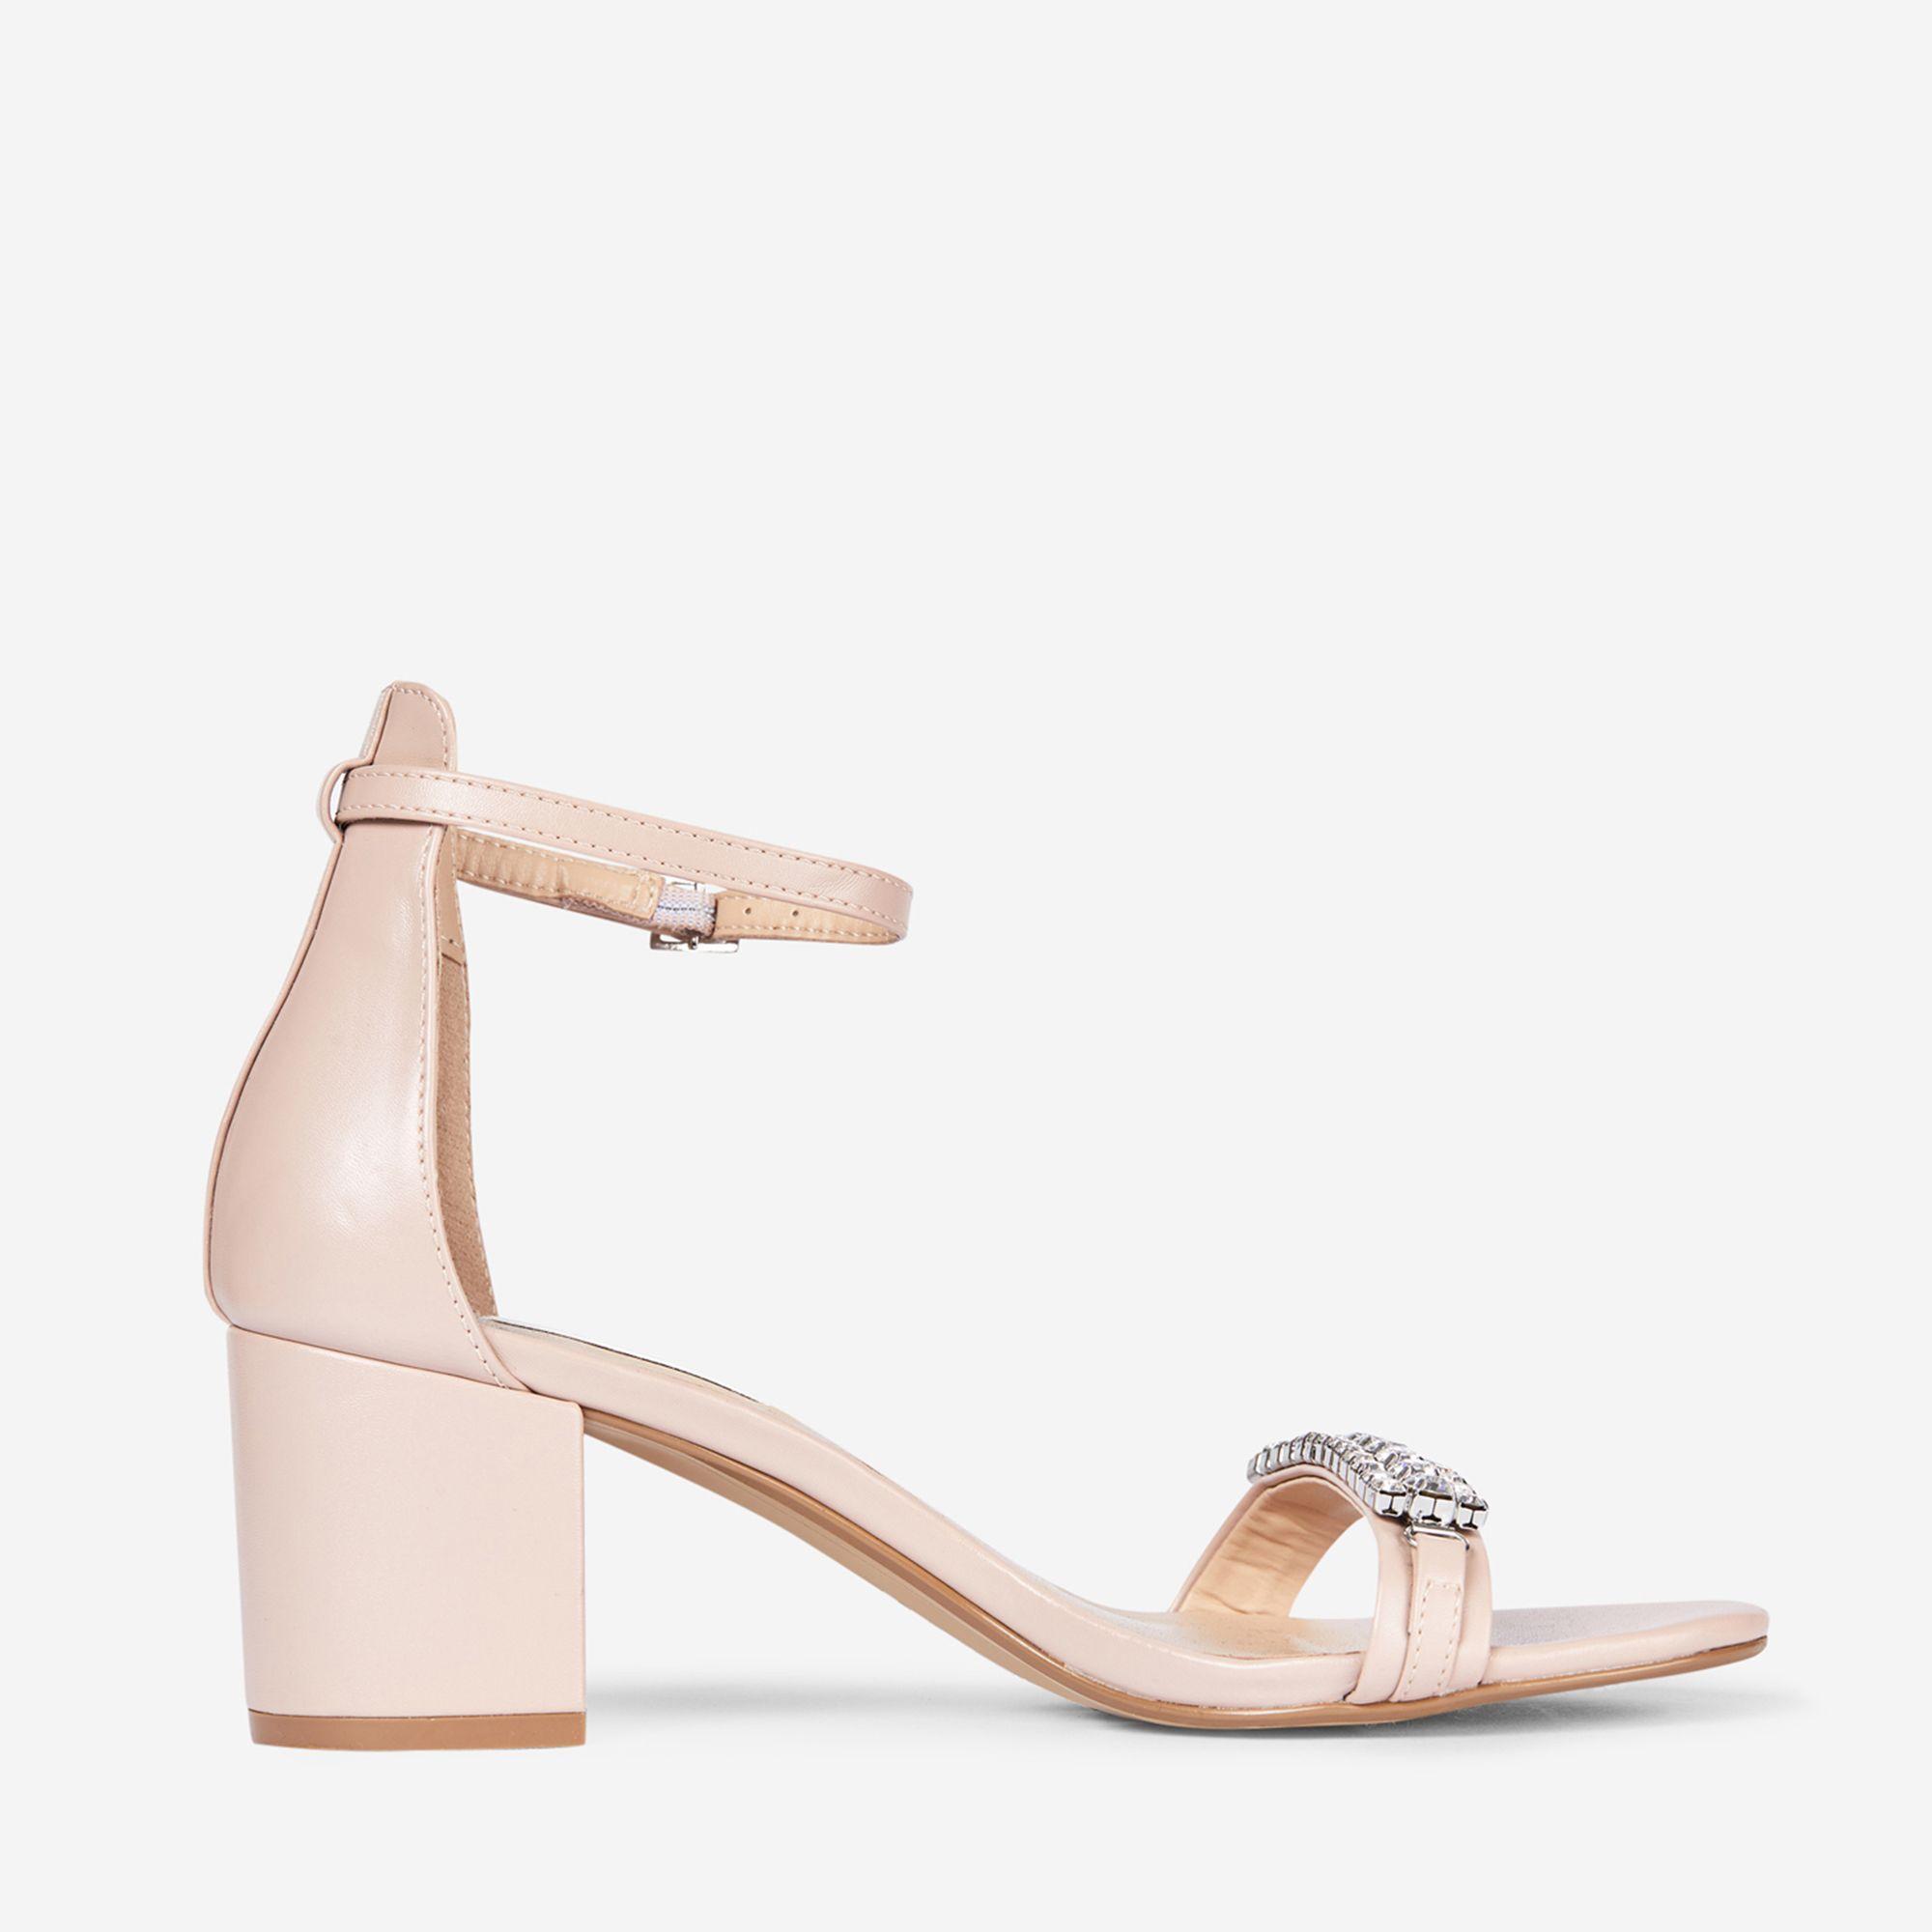 cfcbd7688885 Dorothy Perkins Showcase Nude Polyurethane Sapphire Sandals in ...